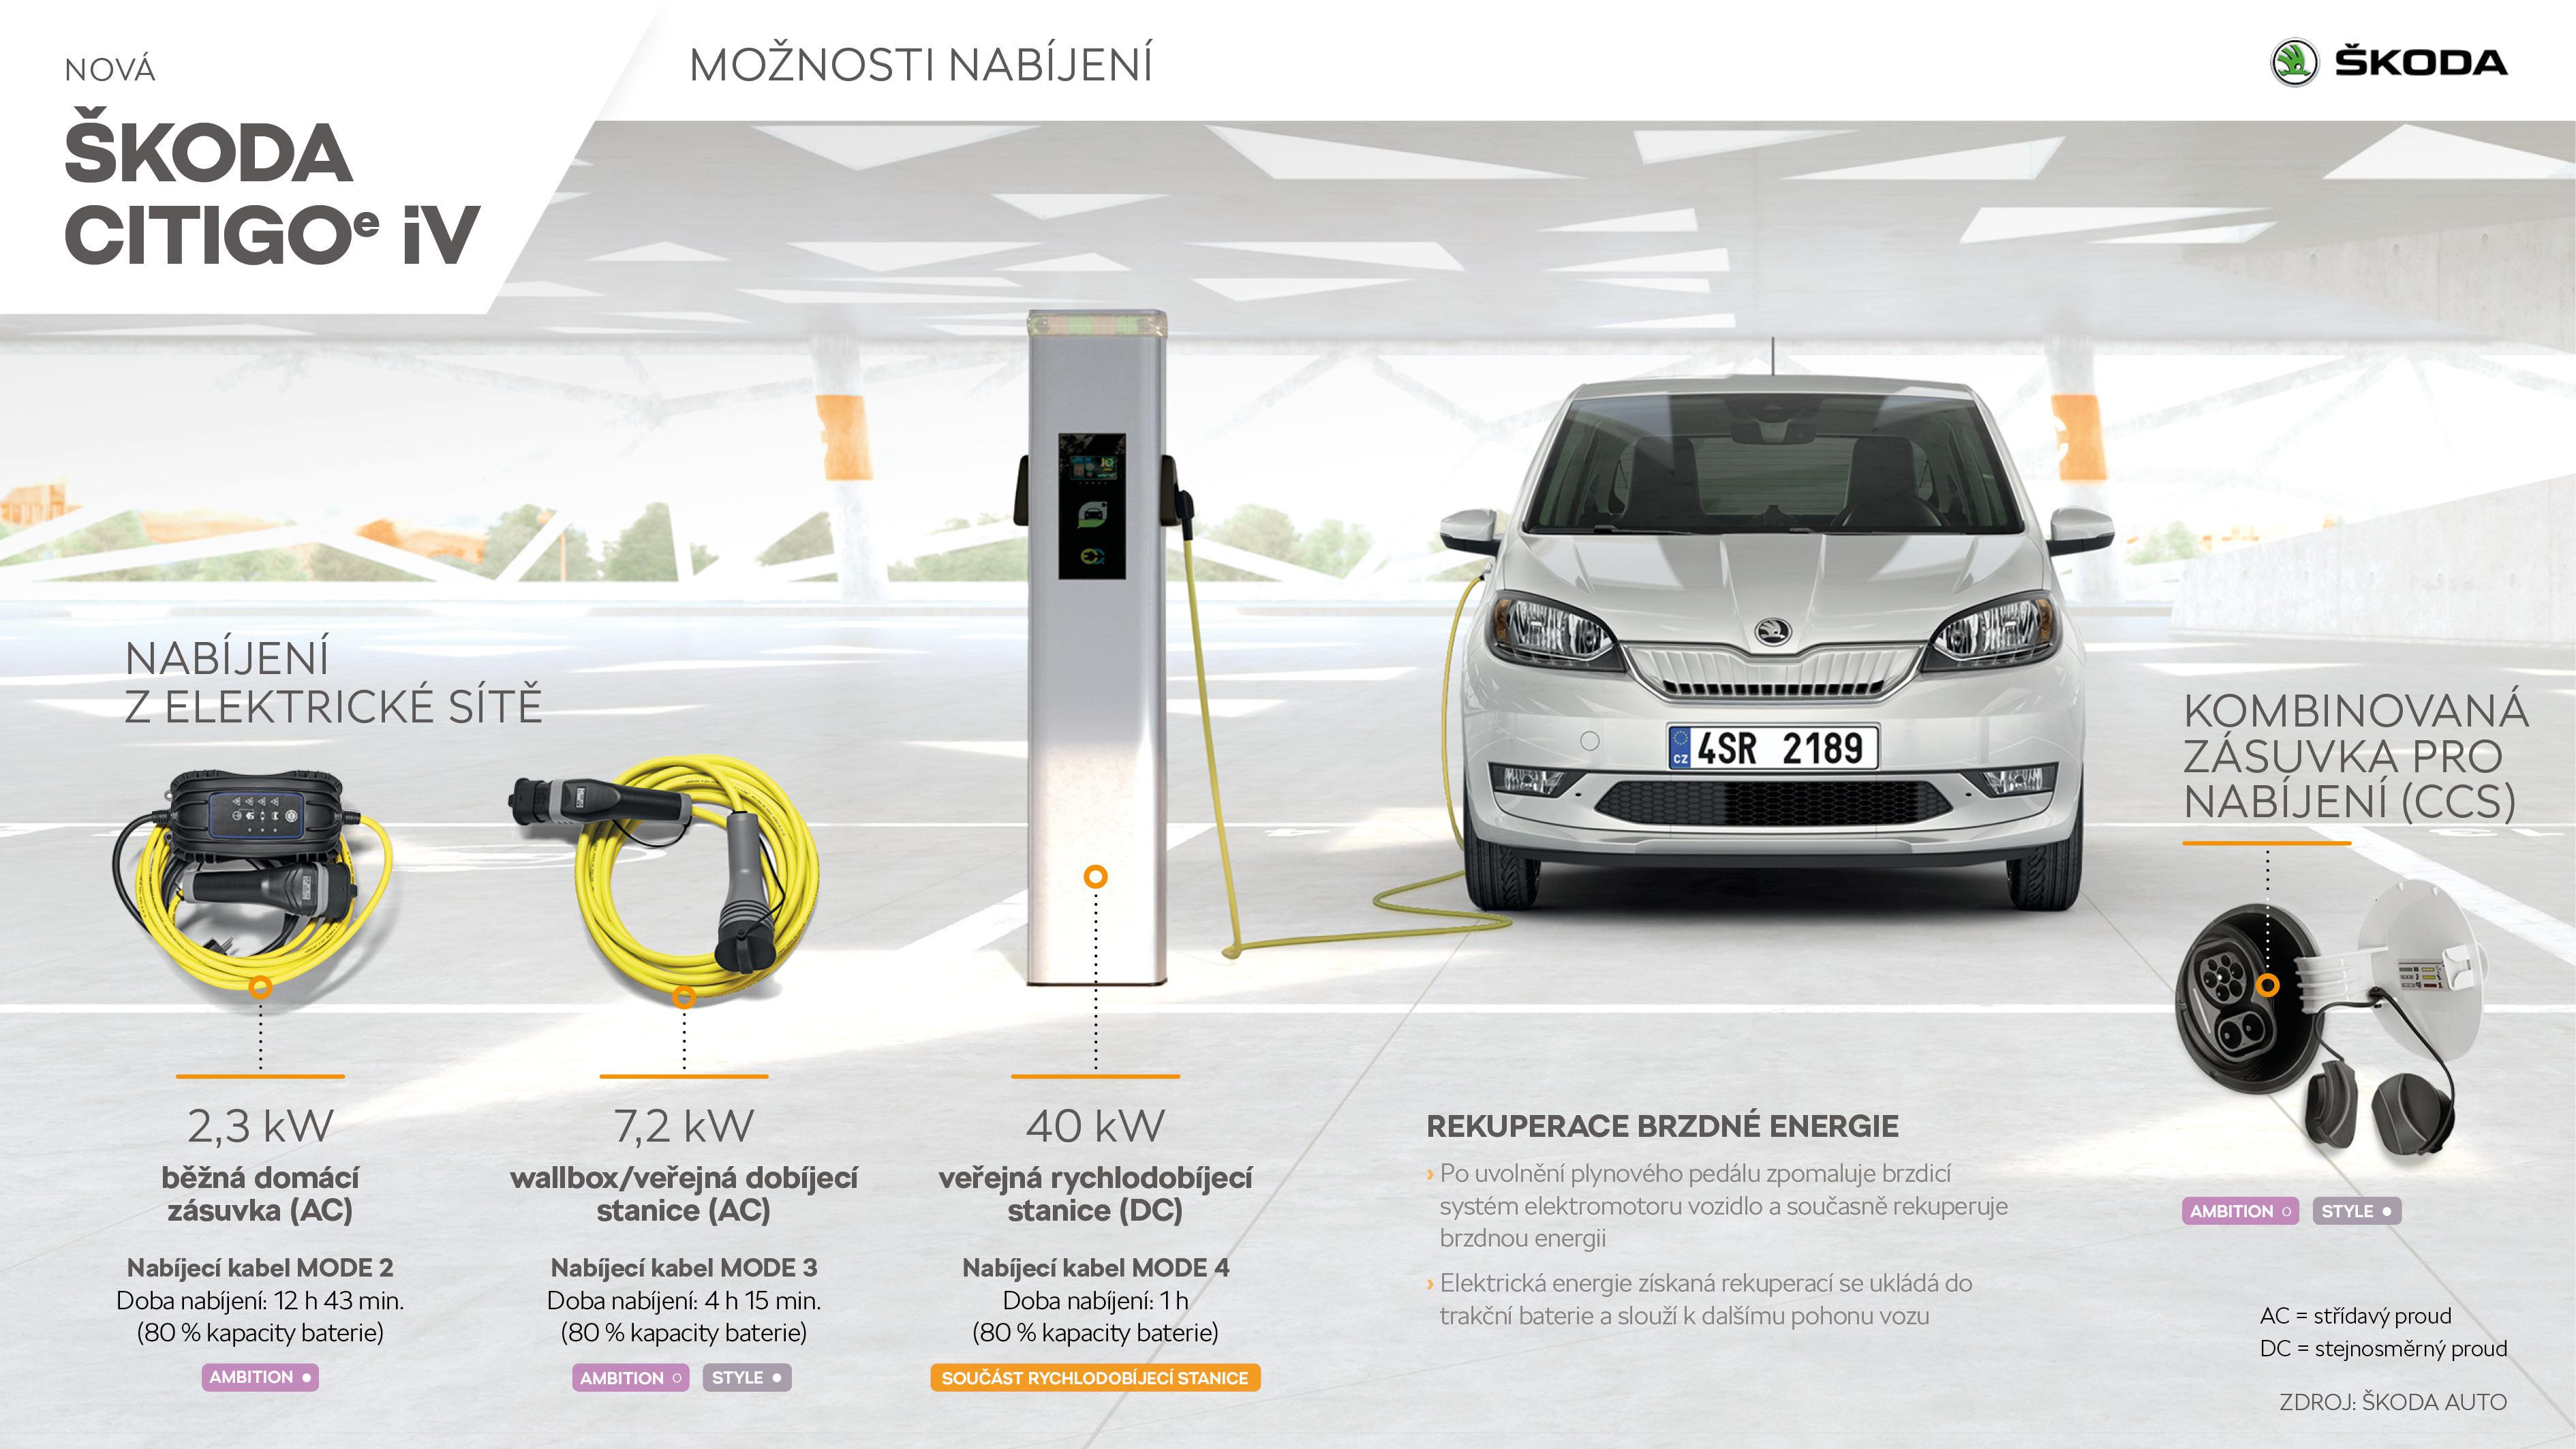 ŠKODACITIGOᵉiV - Infografika